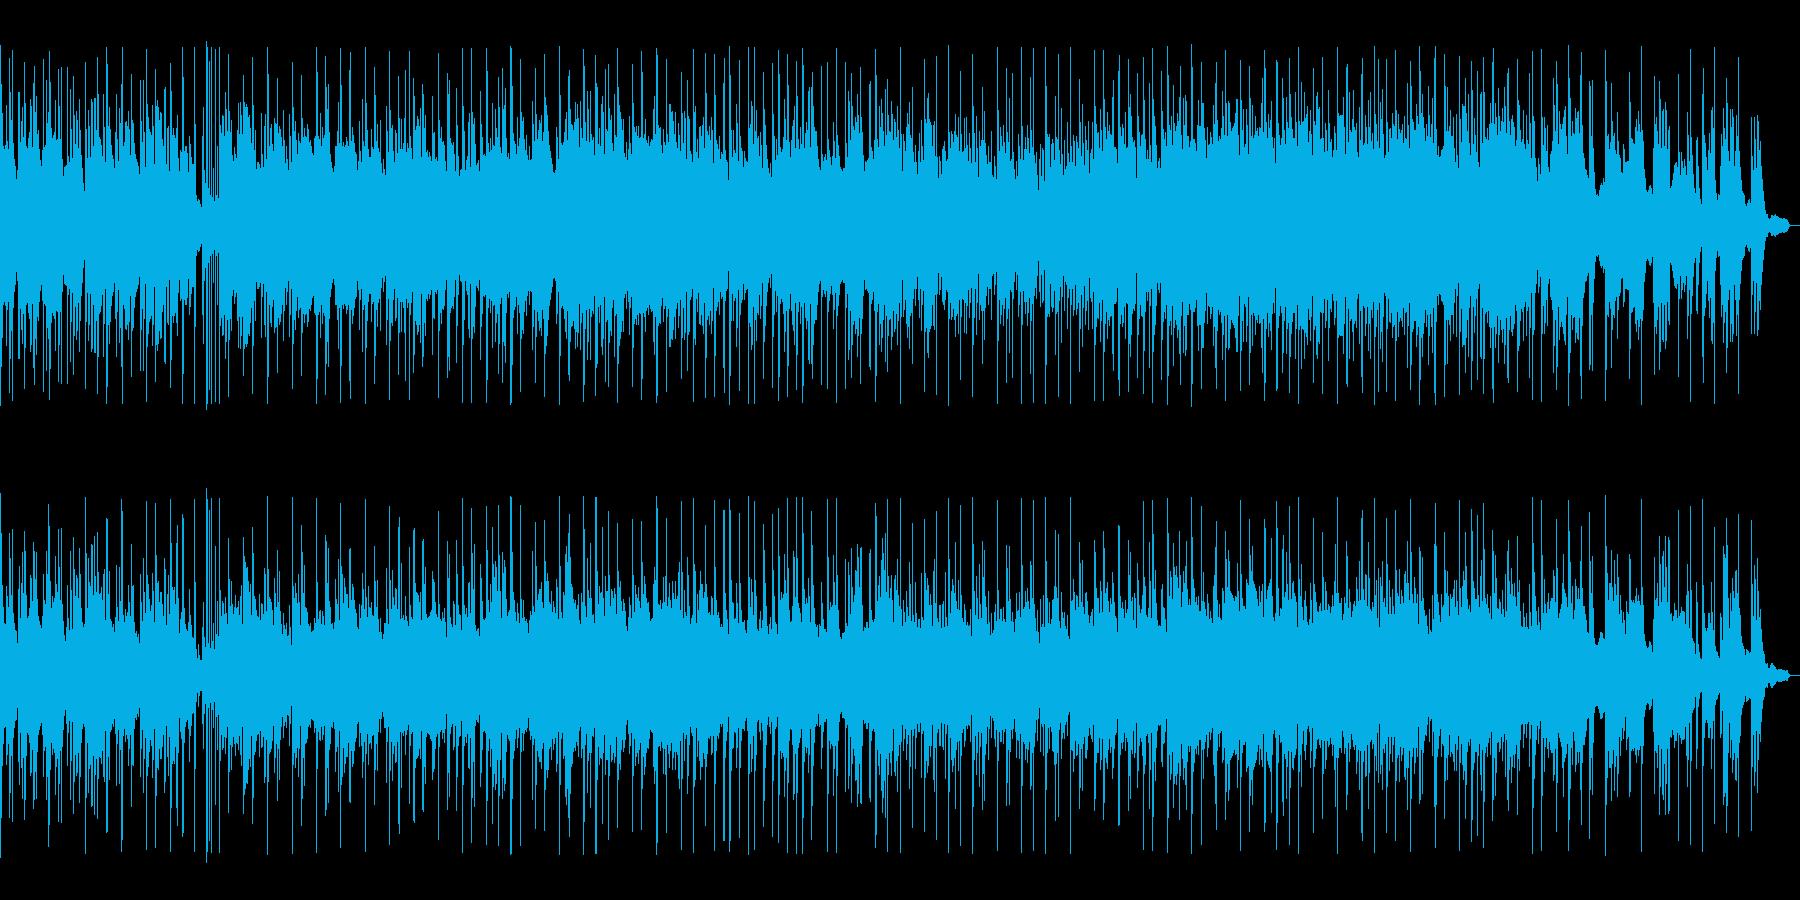 BGM016-01 ピアノとギターの落…の再生済みの波形